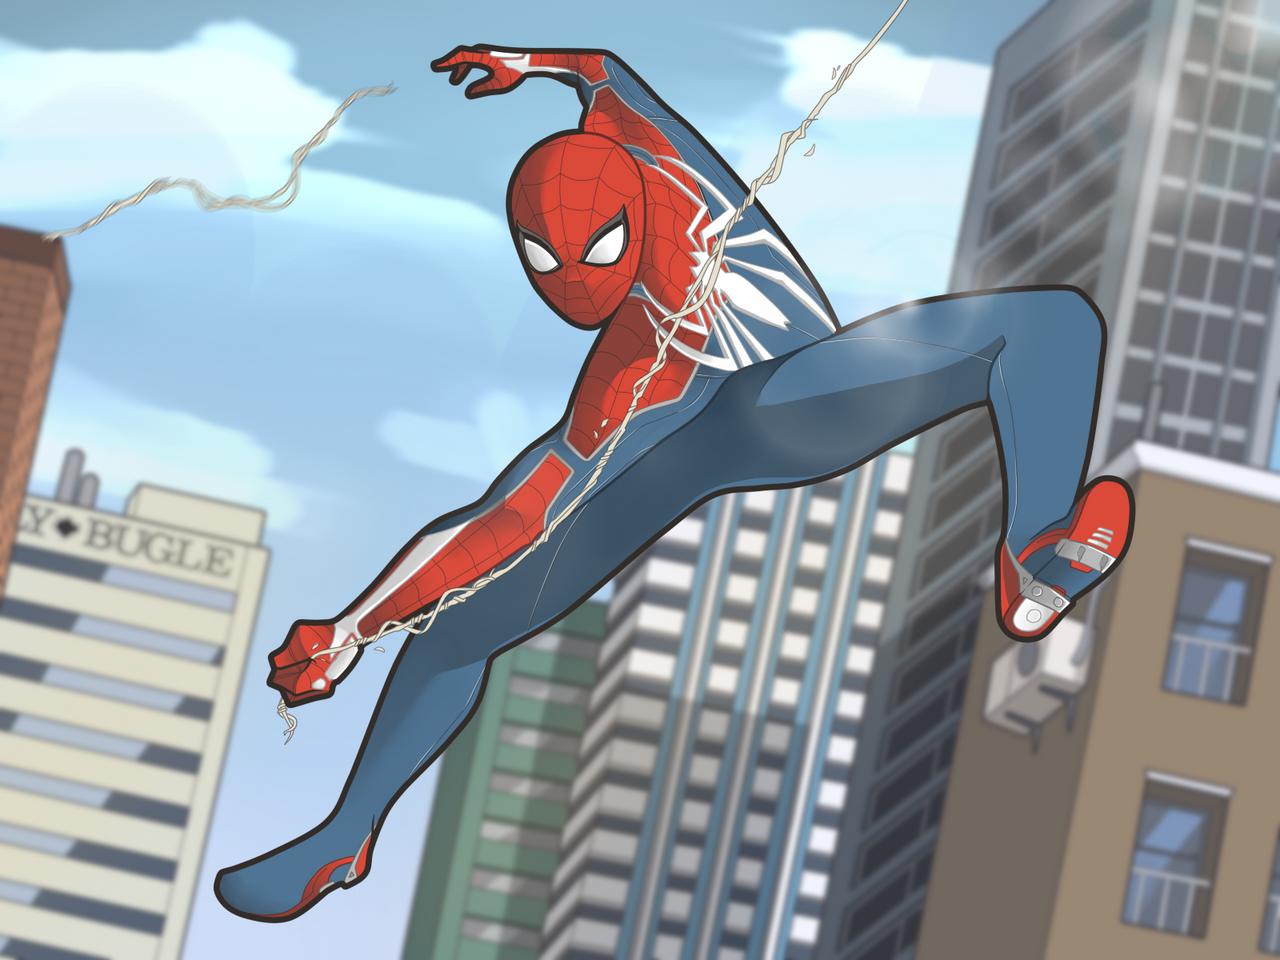 spiderman steven crowder takes - HD1280×960